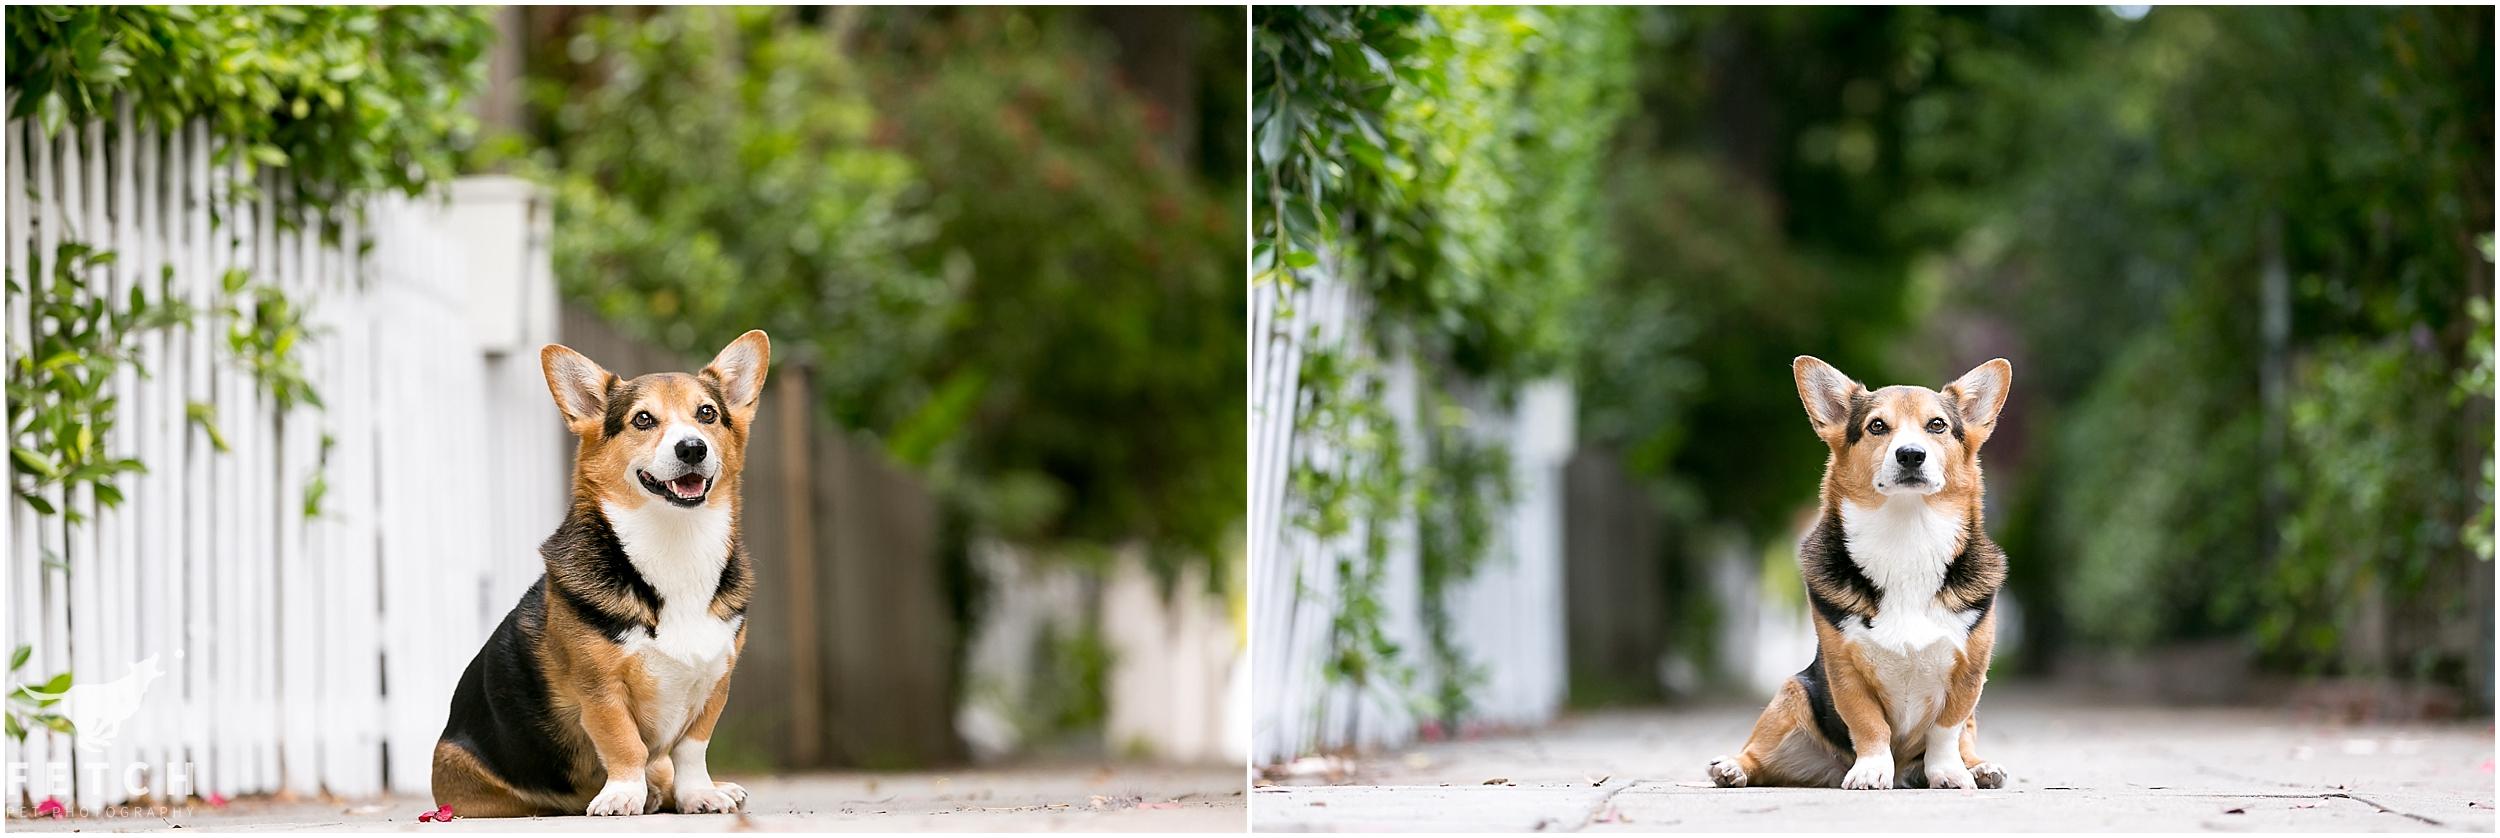 corgi-white-picket-fence